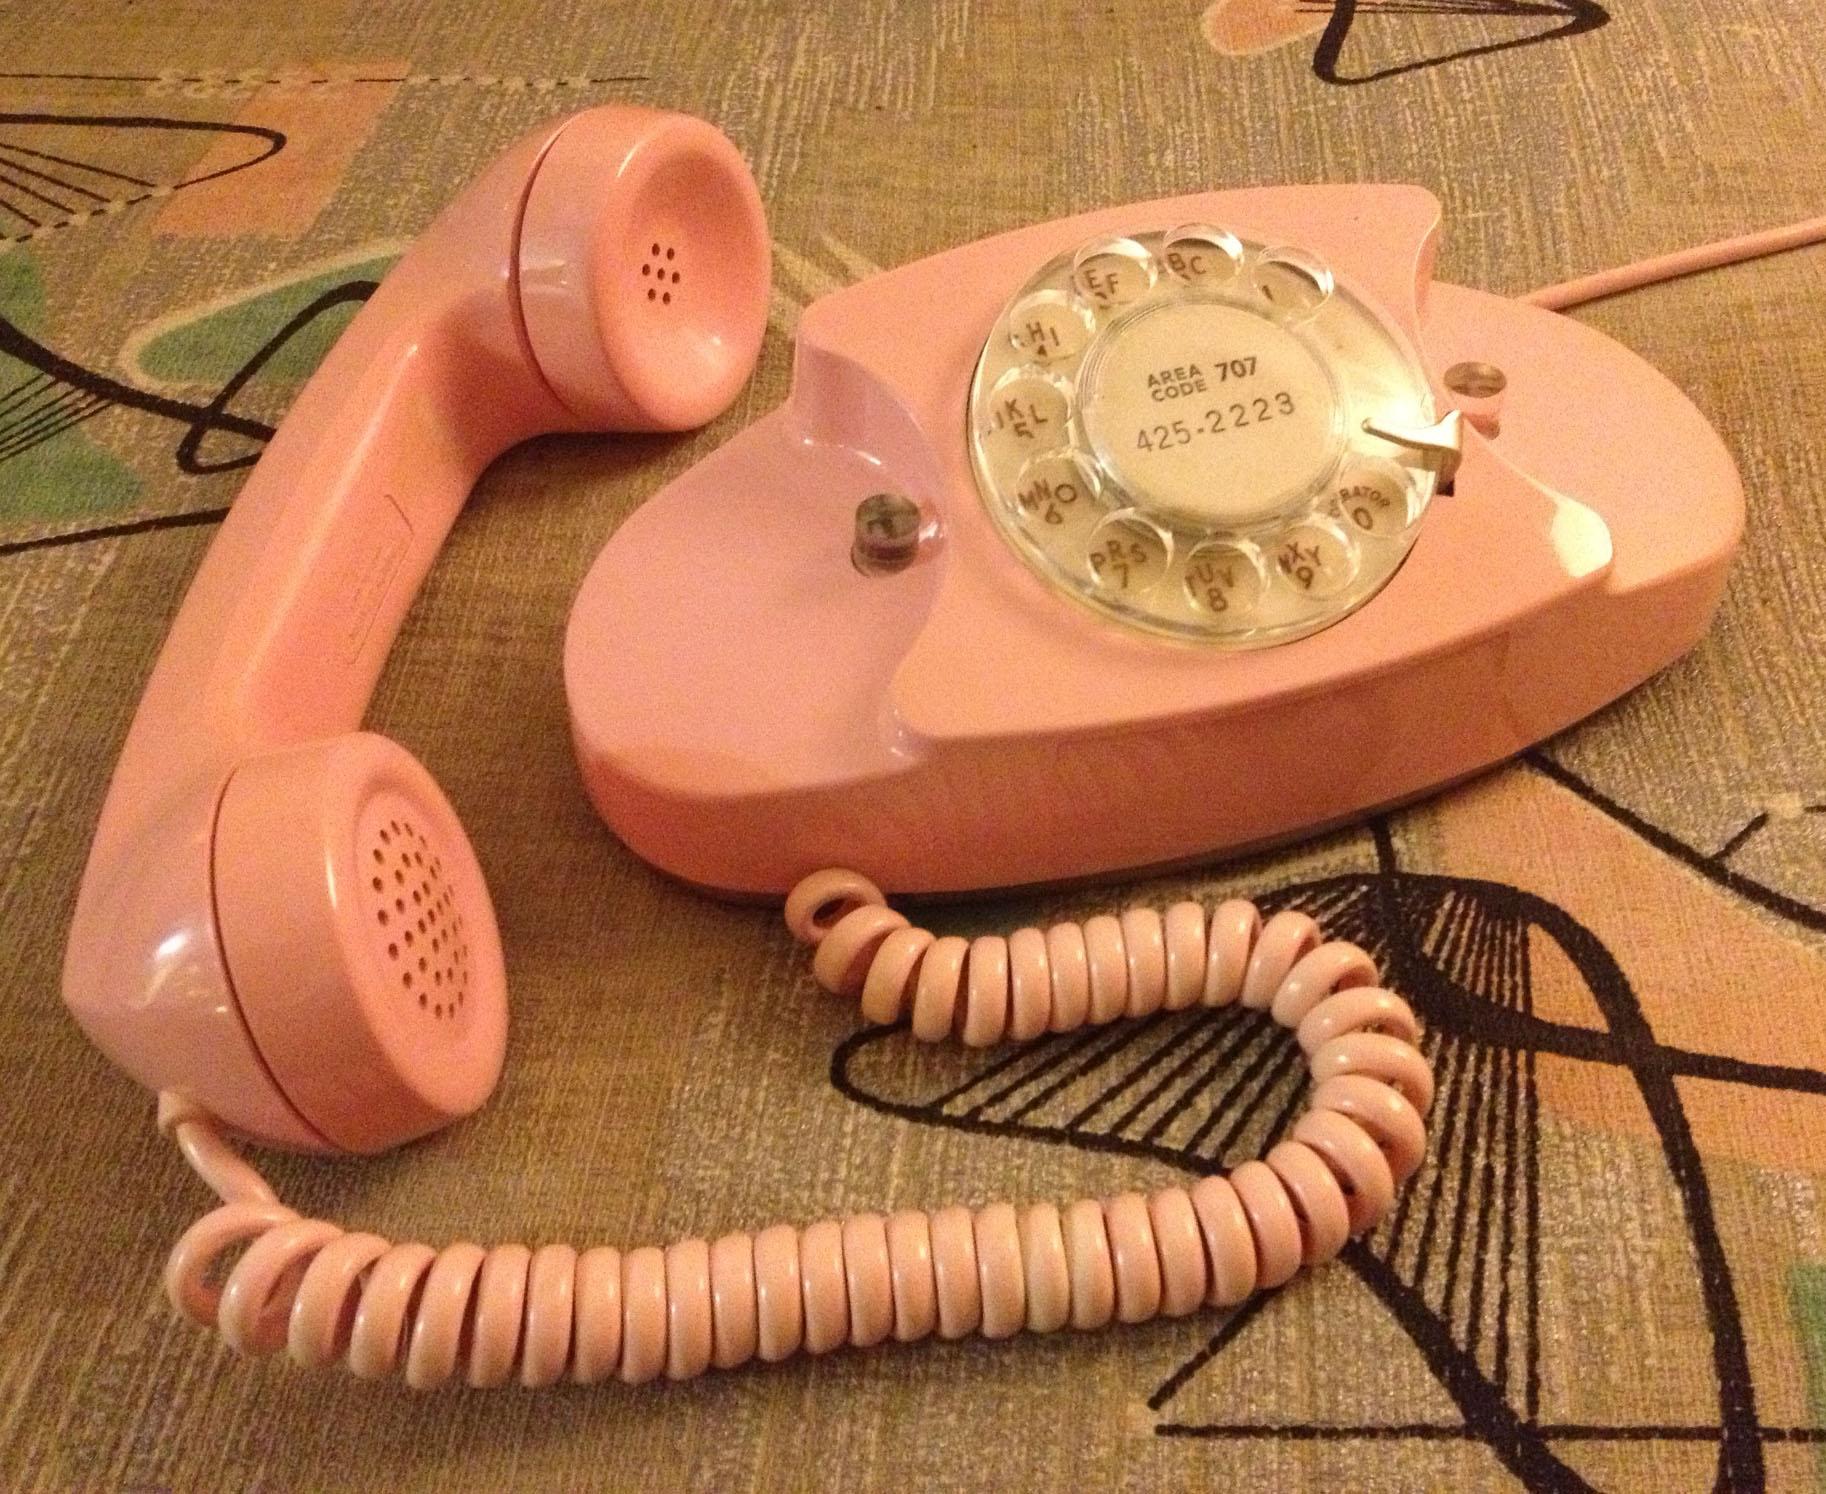 Bell Princess phone